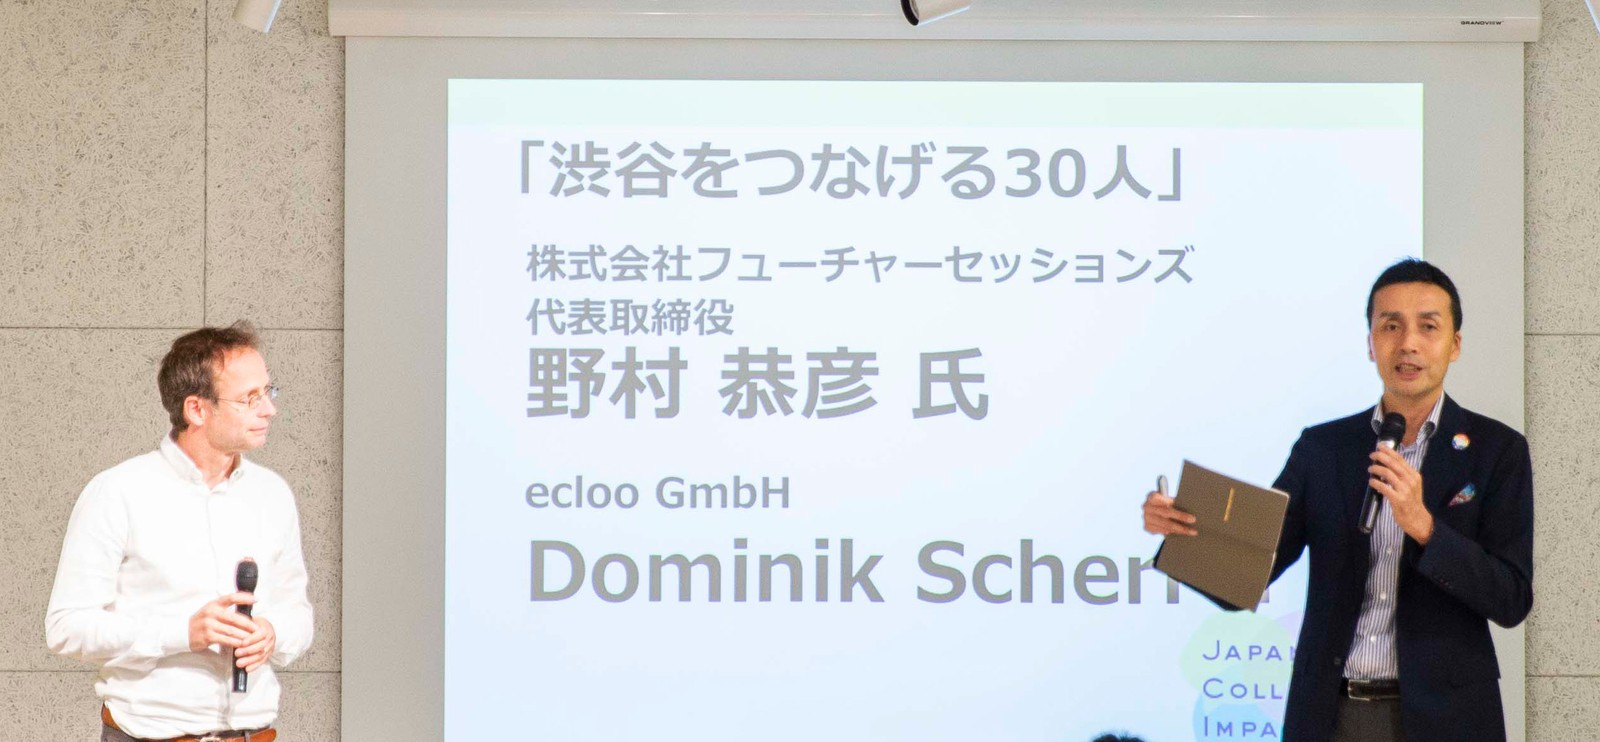 JAPAN COLLECTIVE IMPACT in 渋谷で渋谷をつなげる30人の事例を紹介をする野村恭彦氏とMr. Dominik Scherrer